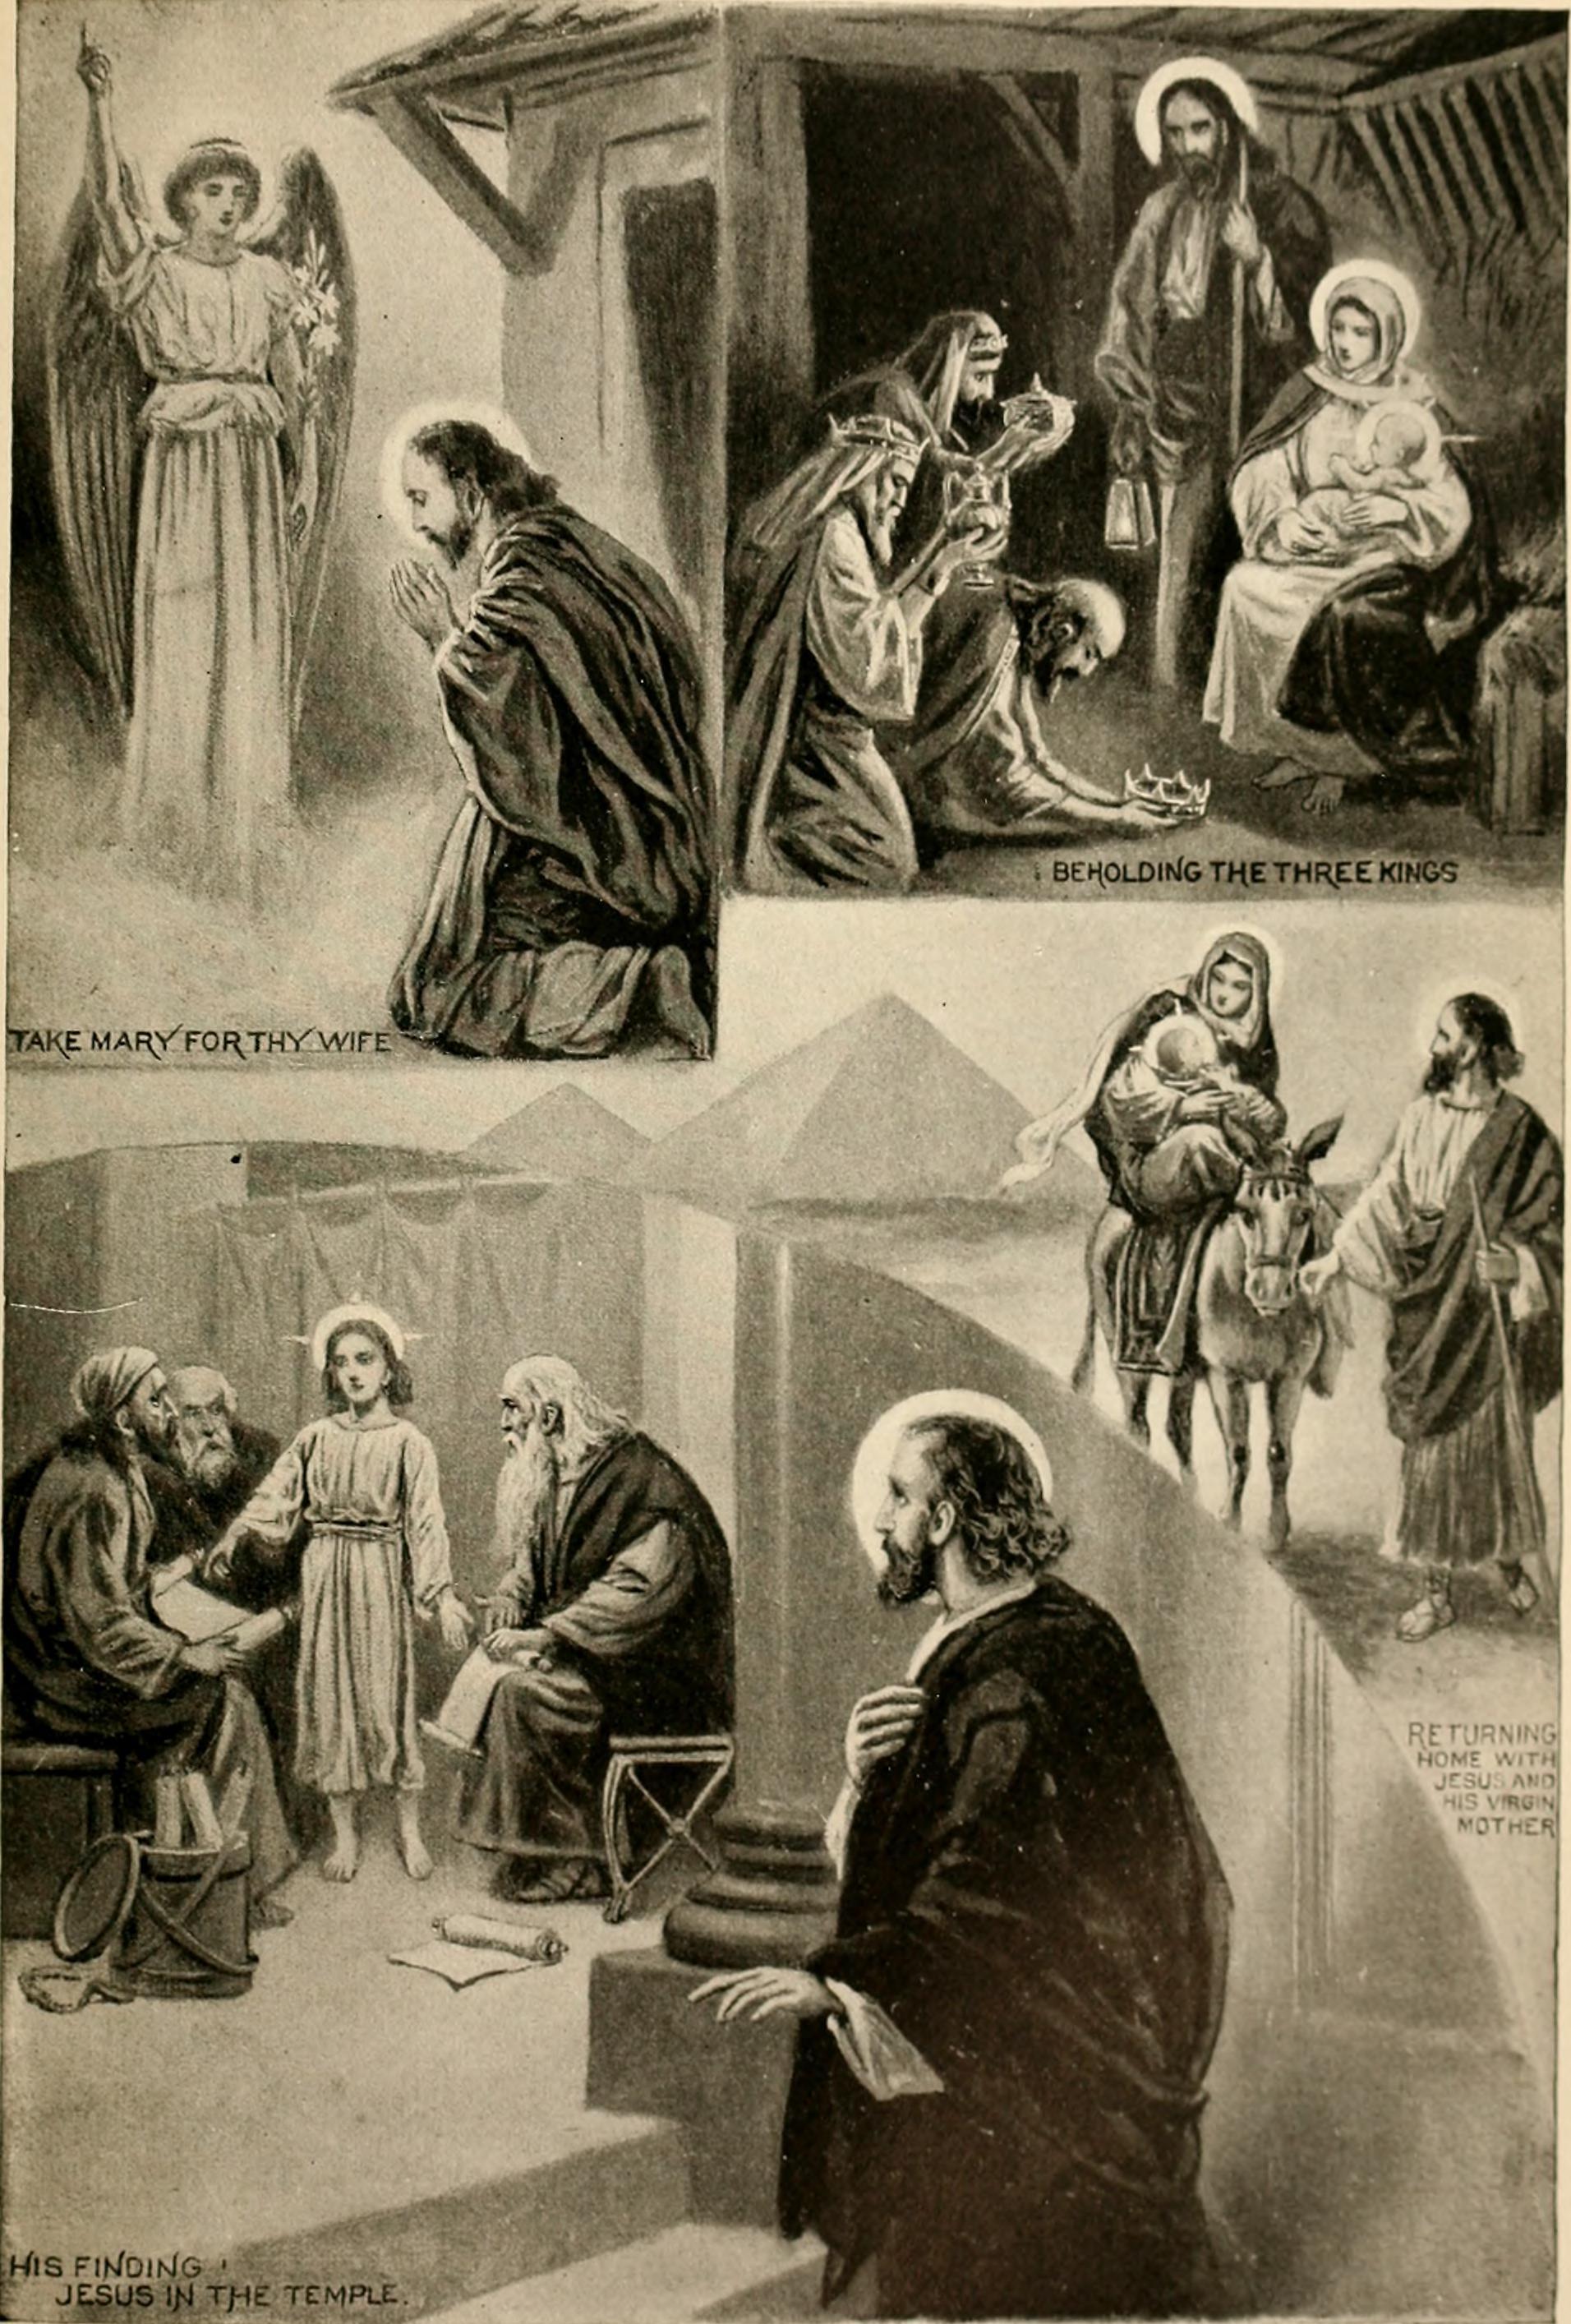 Five Glories of the Catholic Faith (source: WIkimedia)